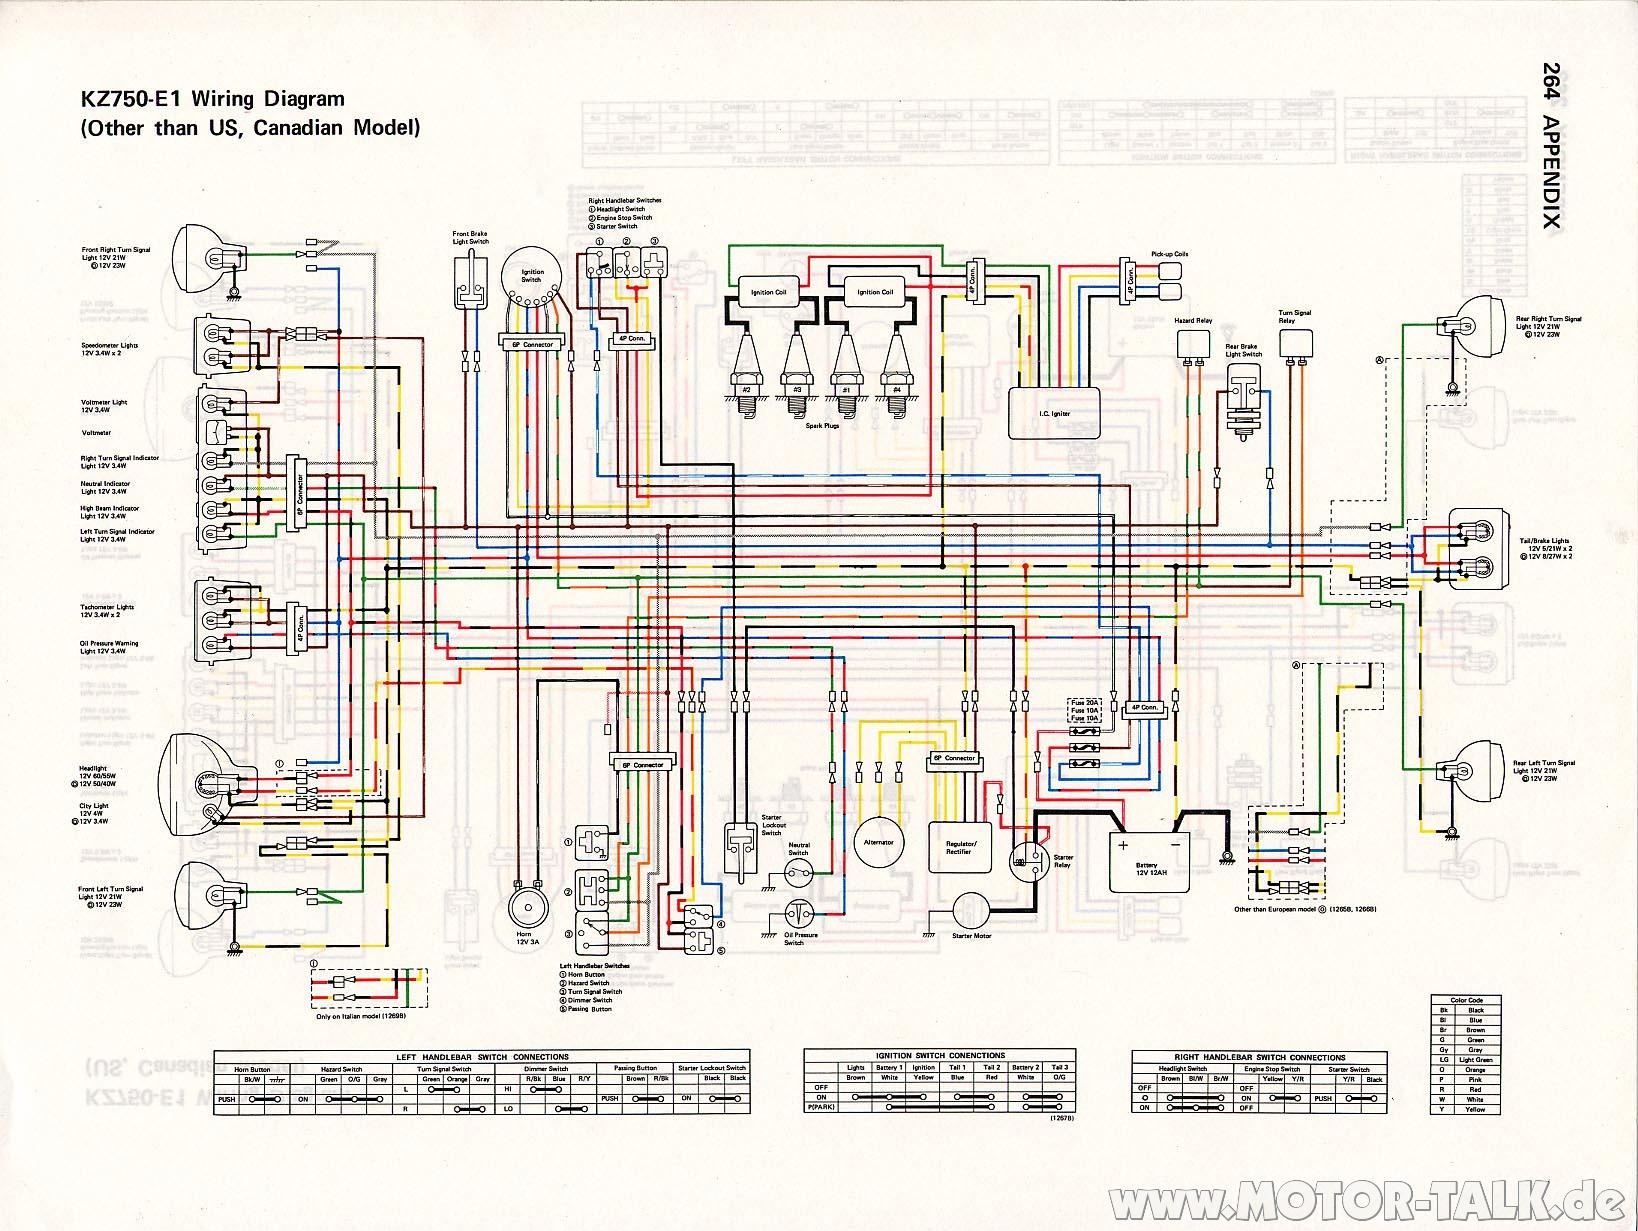 2000 Cb750 Wiring Diagram - Cars Wiring Diagram Blog